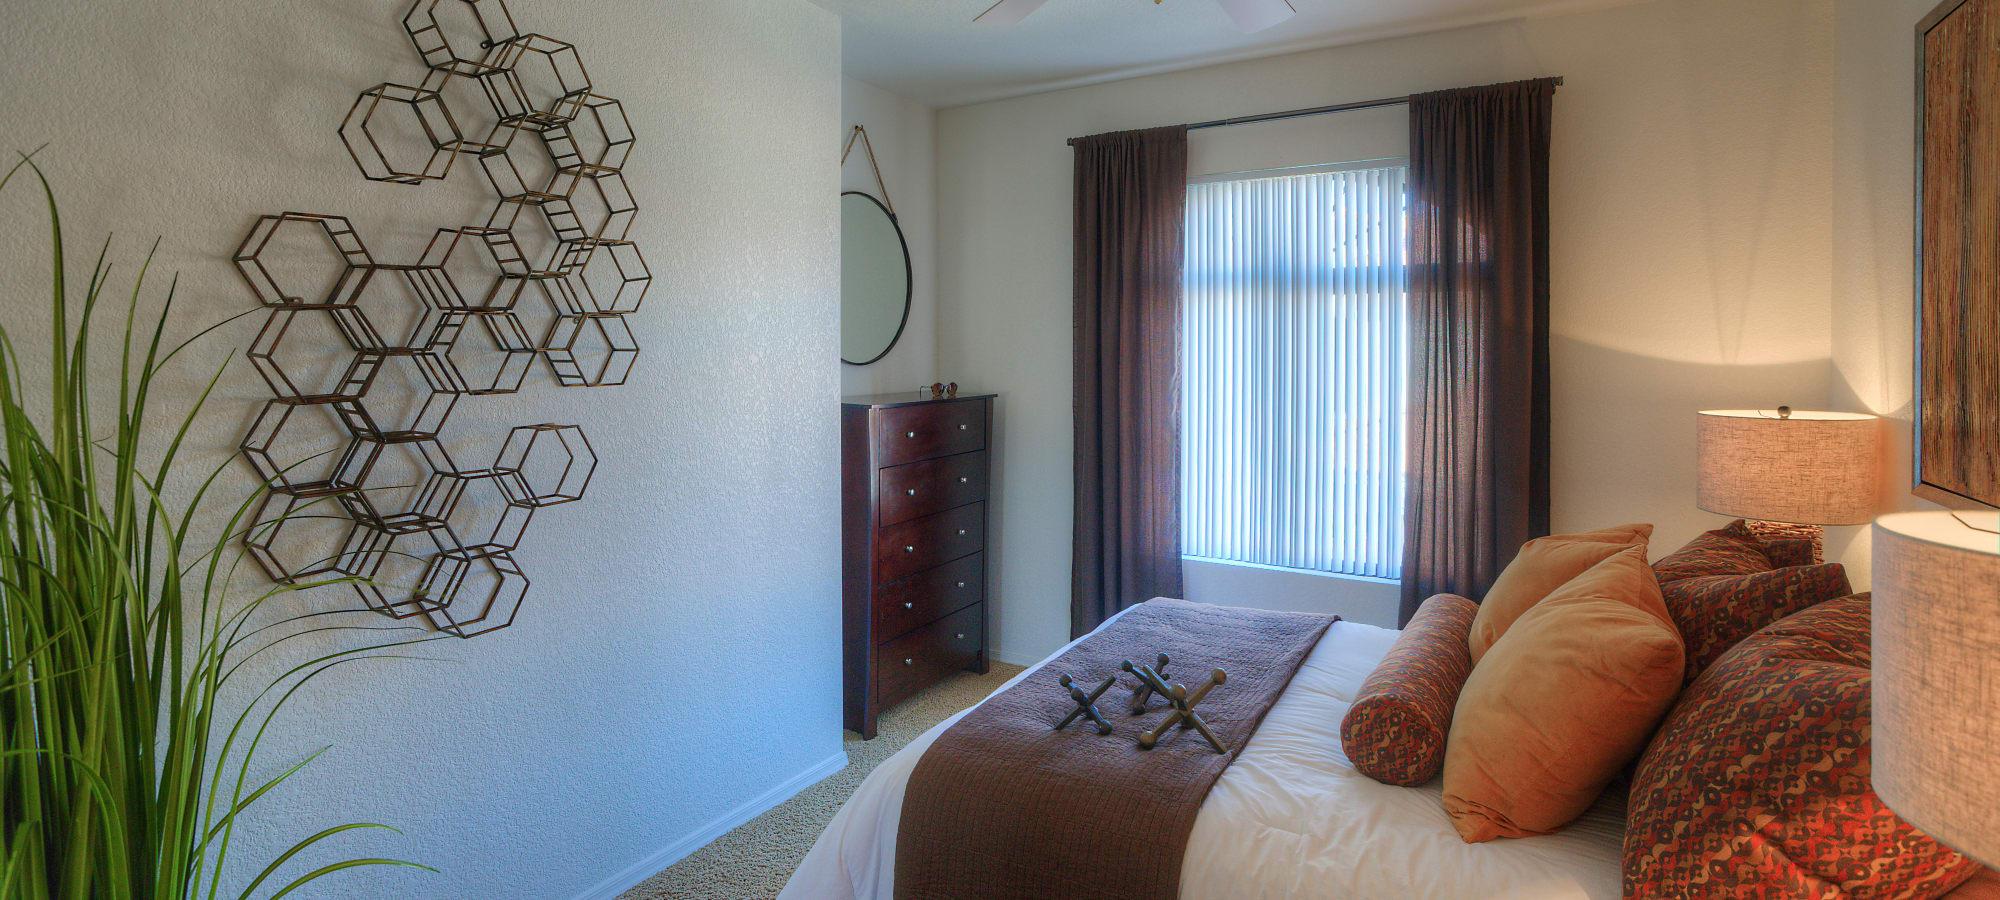 Model bedroom with unique decor at San Prado in Glendale, Arizona